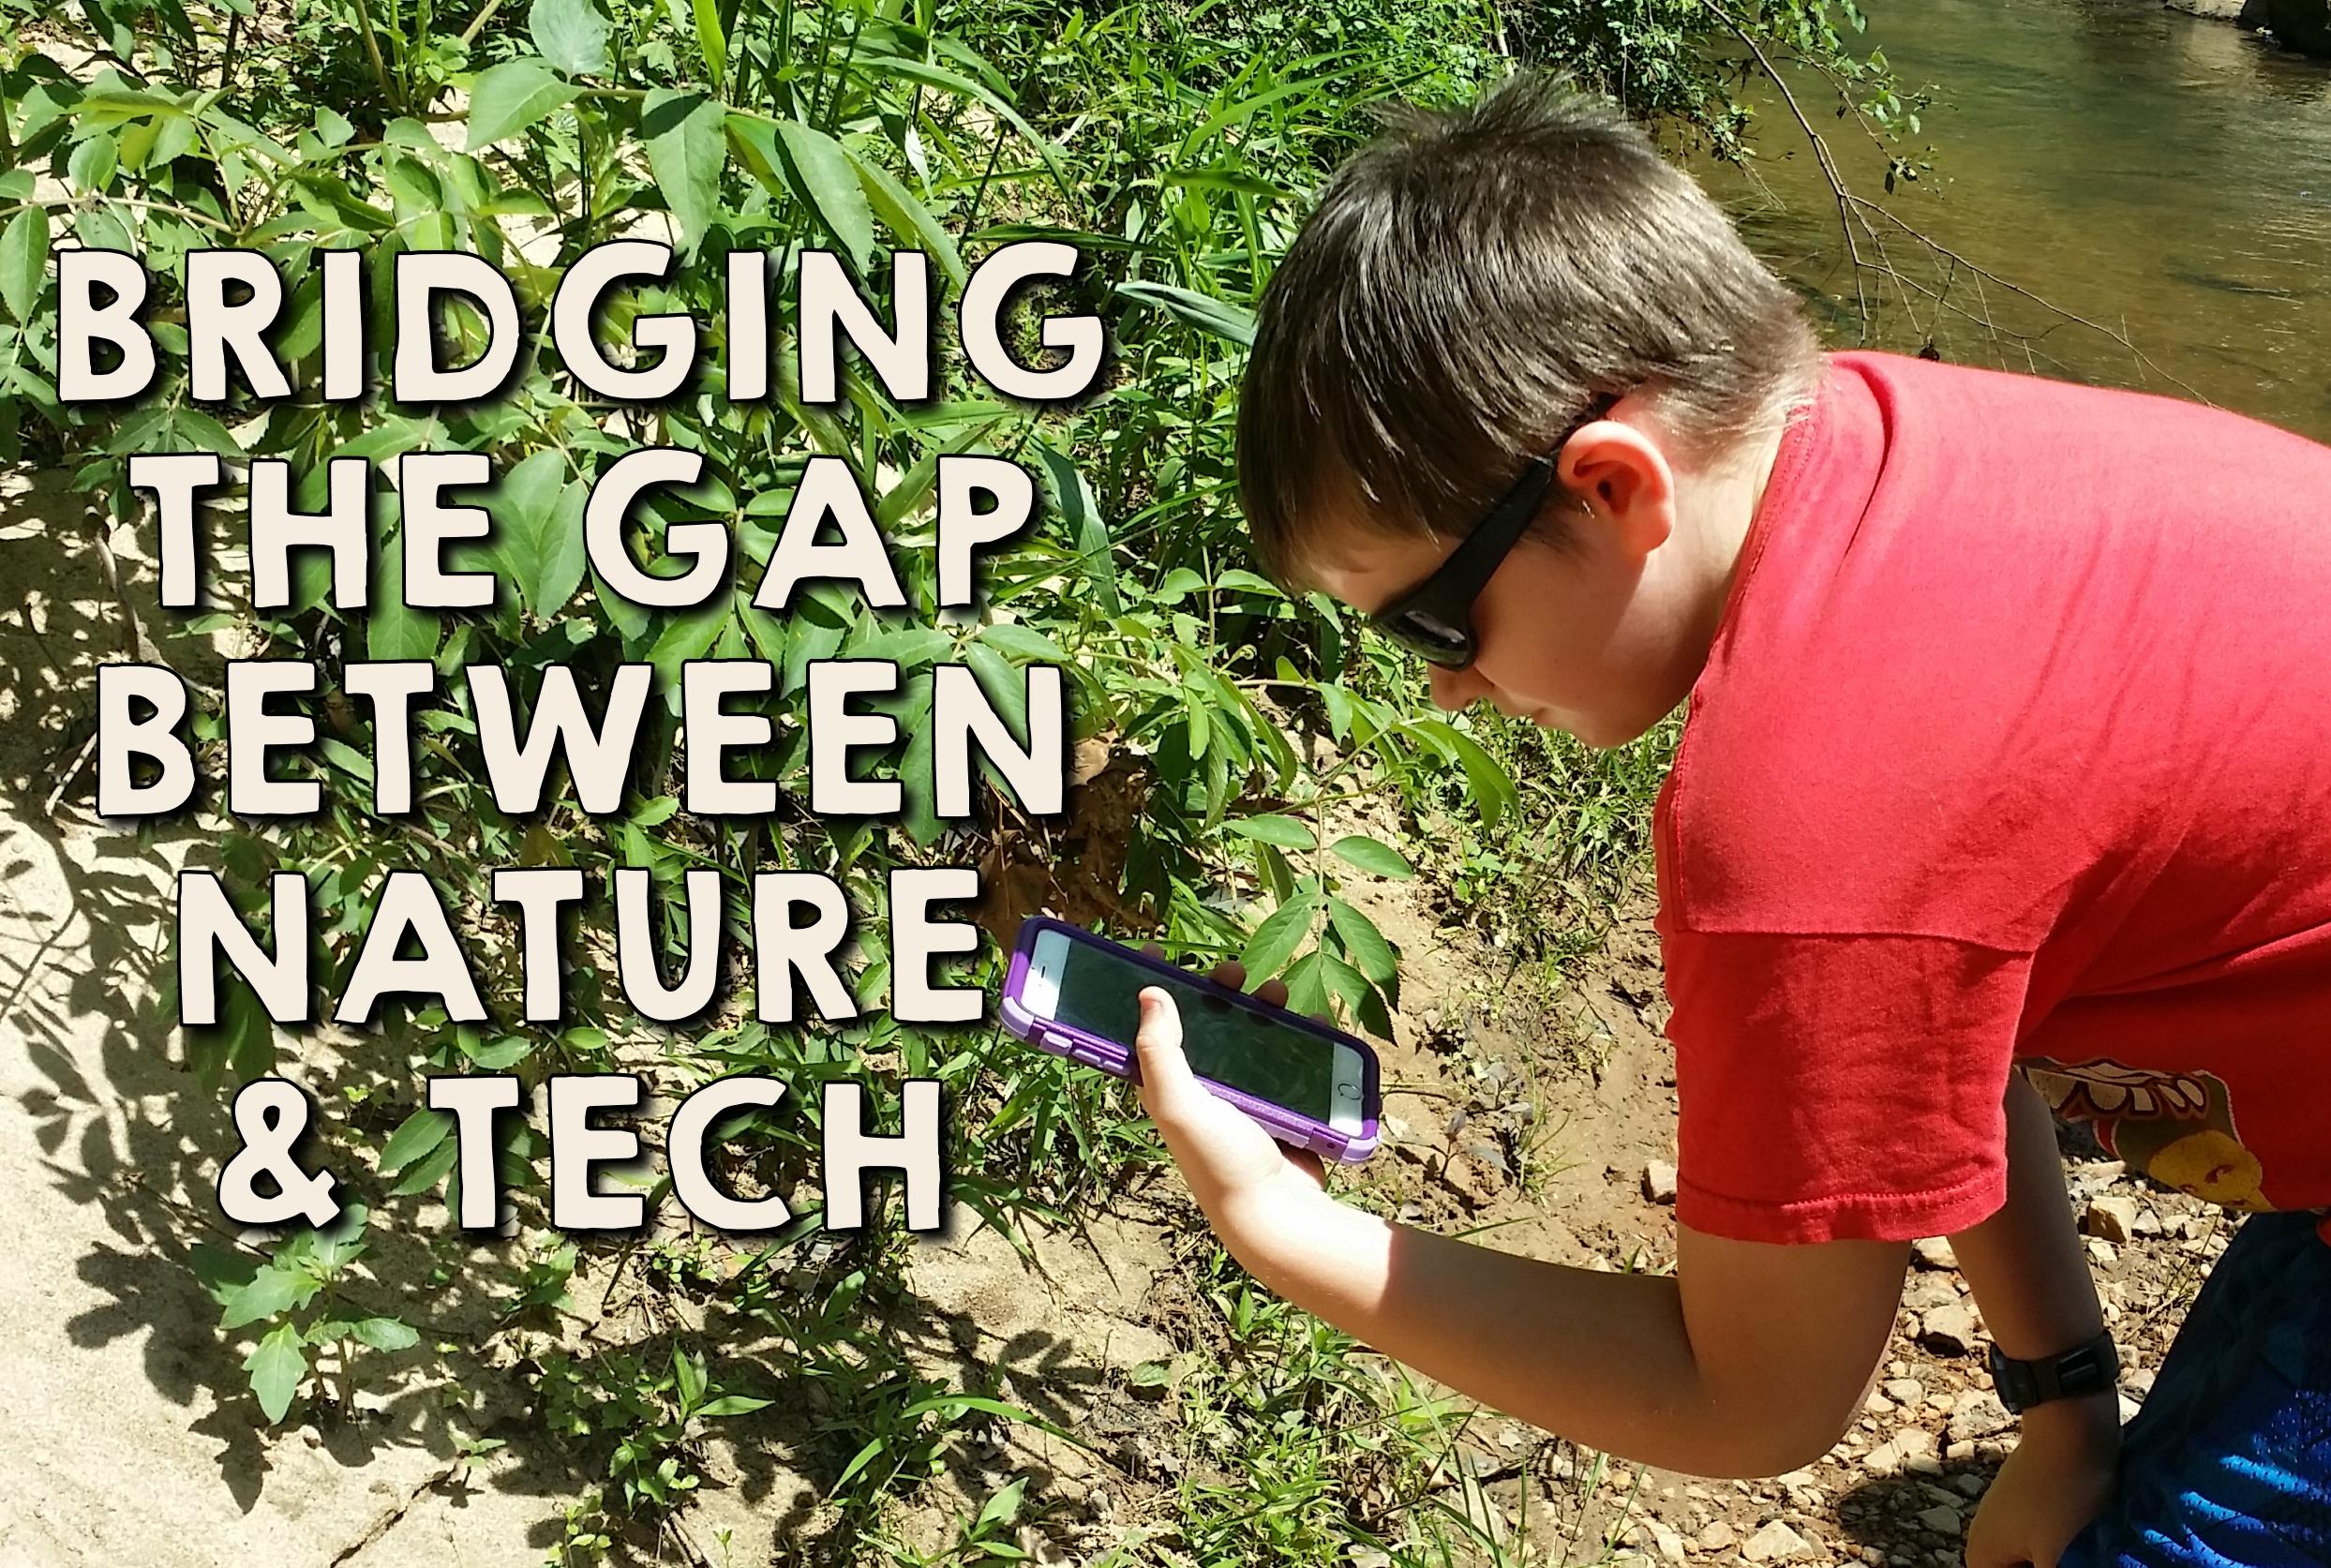 Bridging the Gap Between Nature and Tech